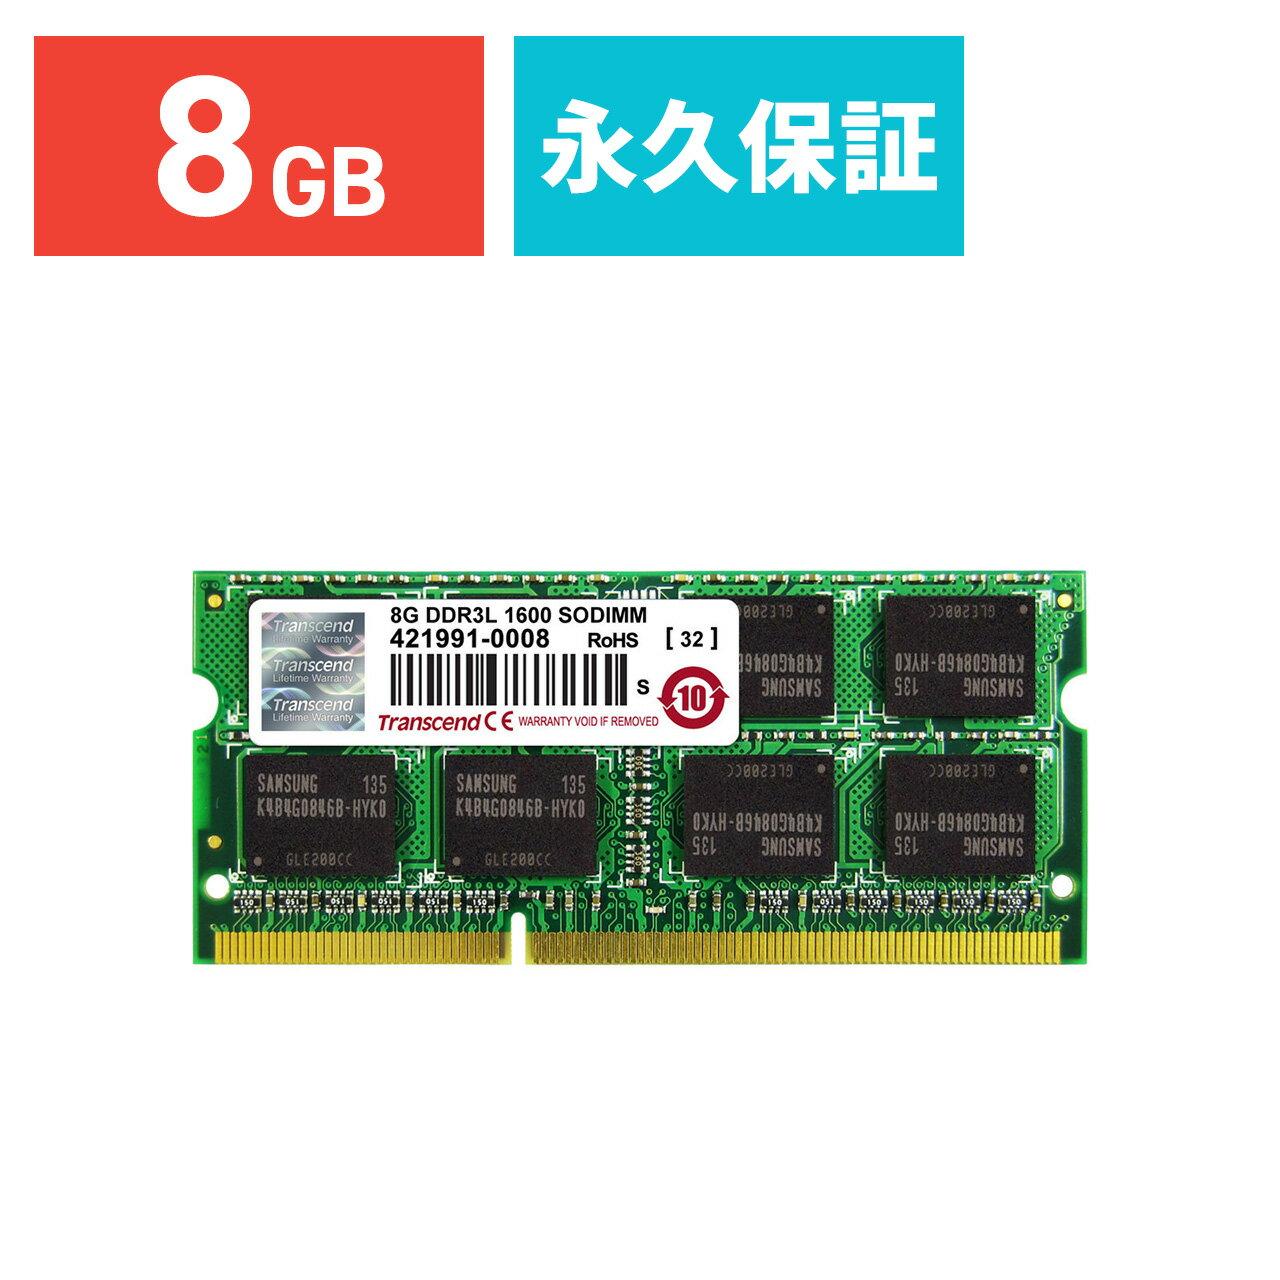 Transcend 増設メモリー 8GB ノートPC用 DDR3L-1600 PC3L-12800 SO-DIMM 低電圧 PCメモリ メモリーモジュール [TS1GSK64W6H]【ネコポス対応】【楽天BOX受取対象商品】【送料無料】